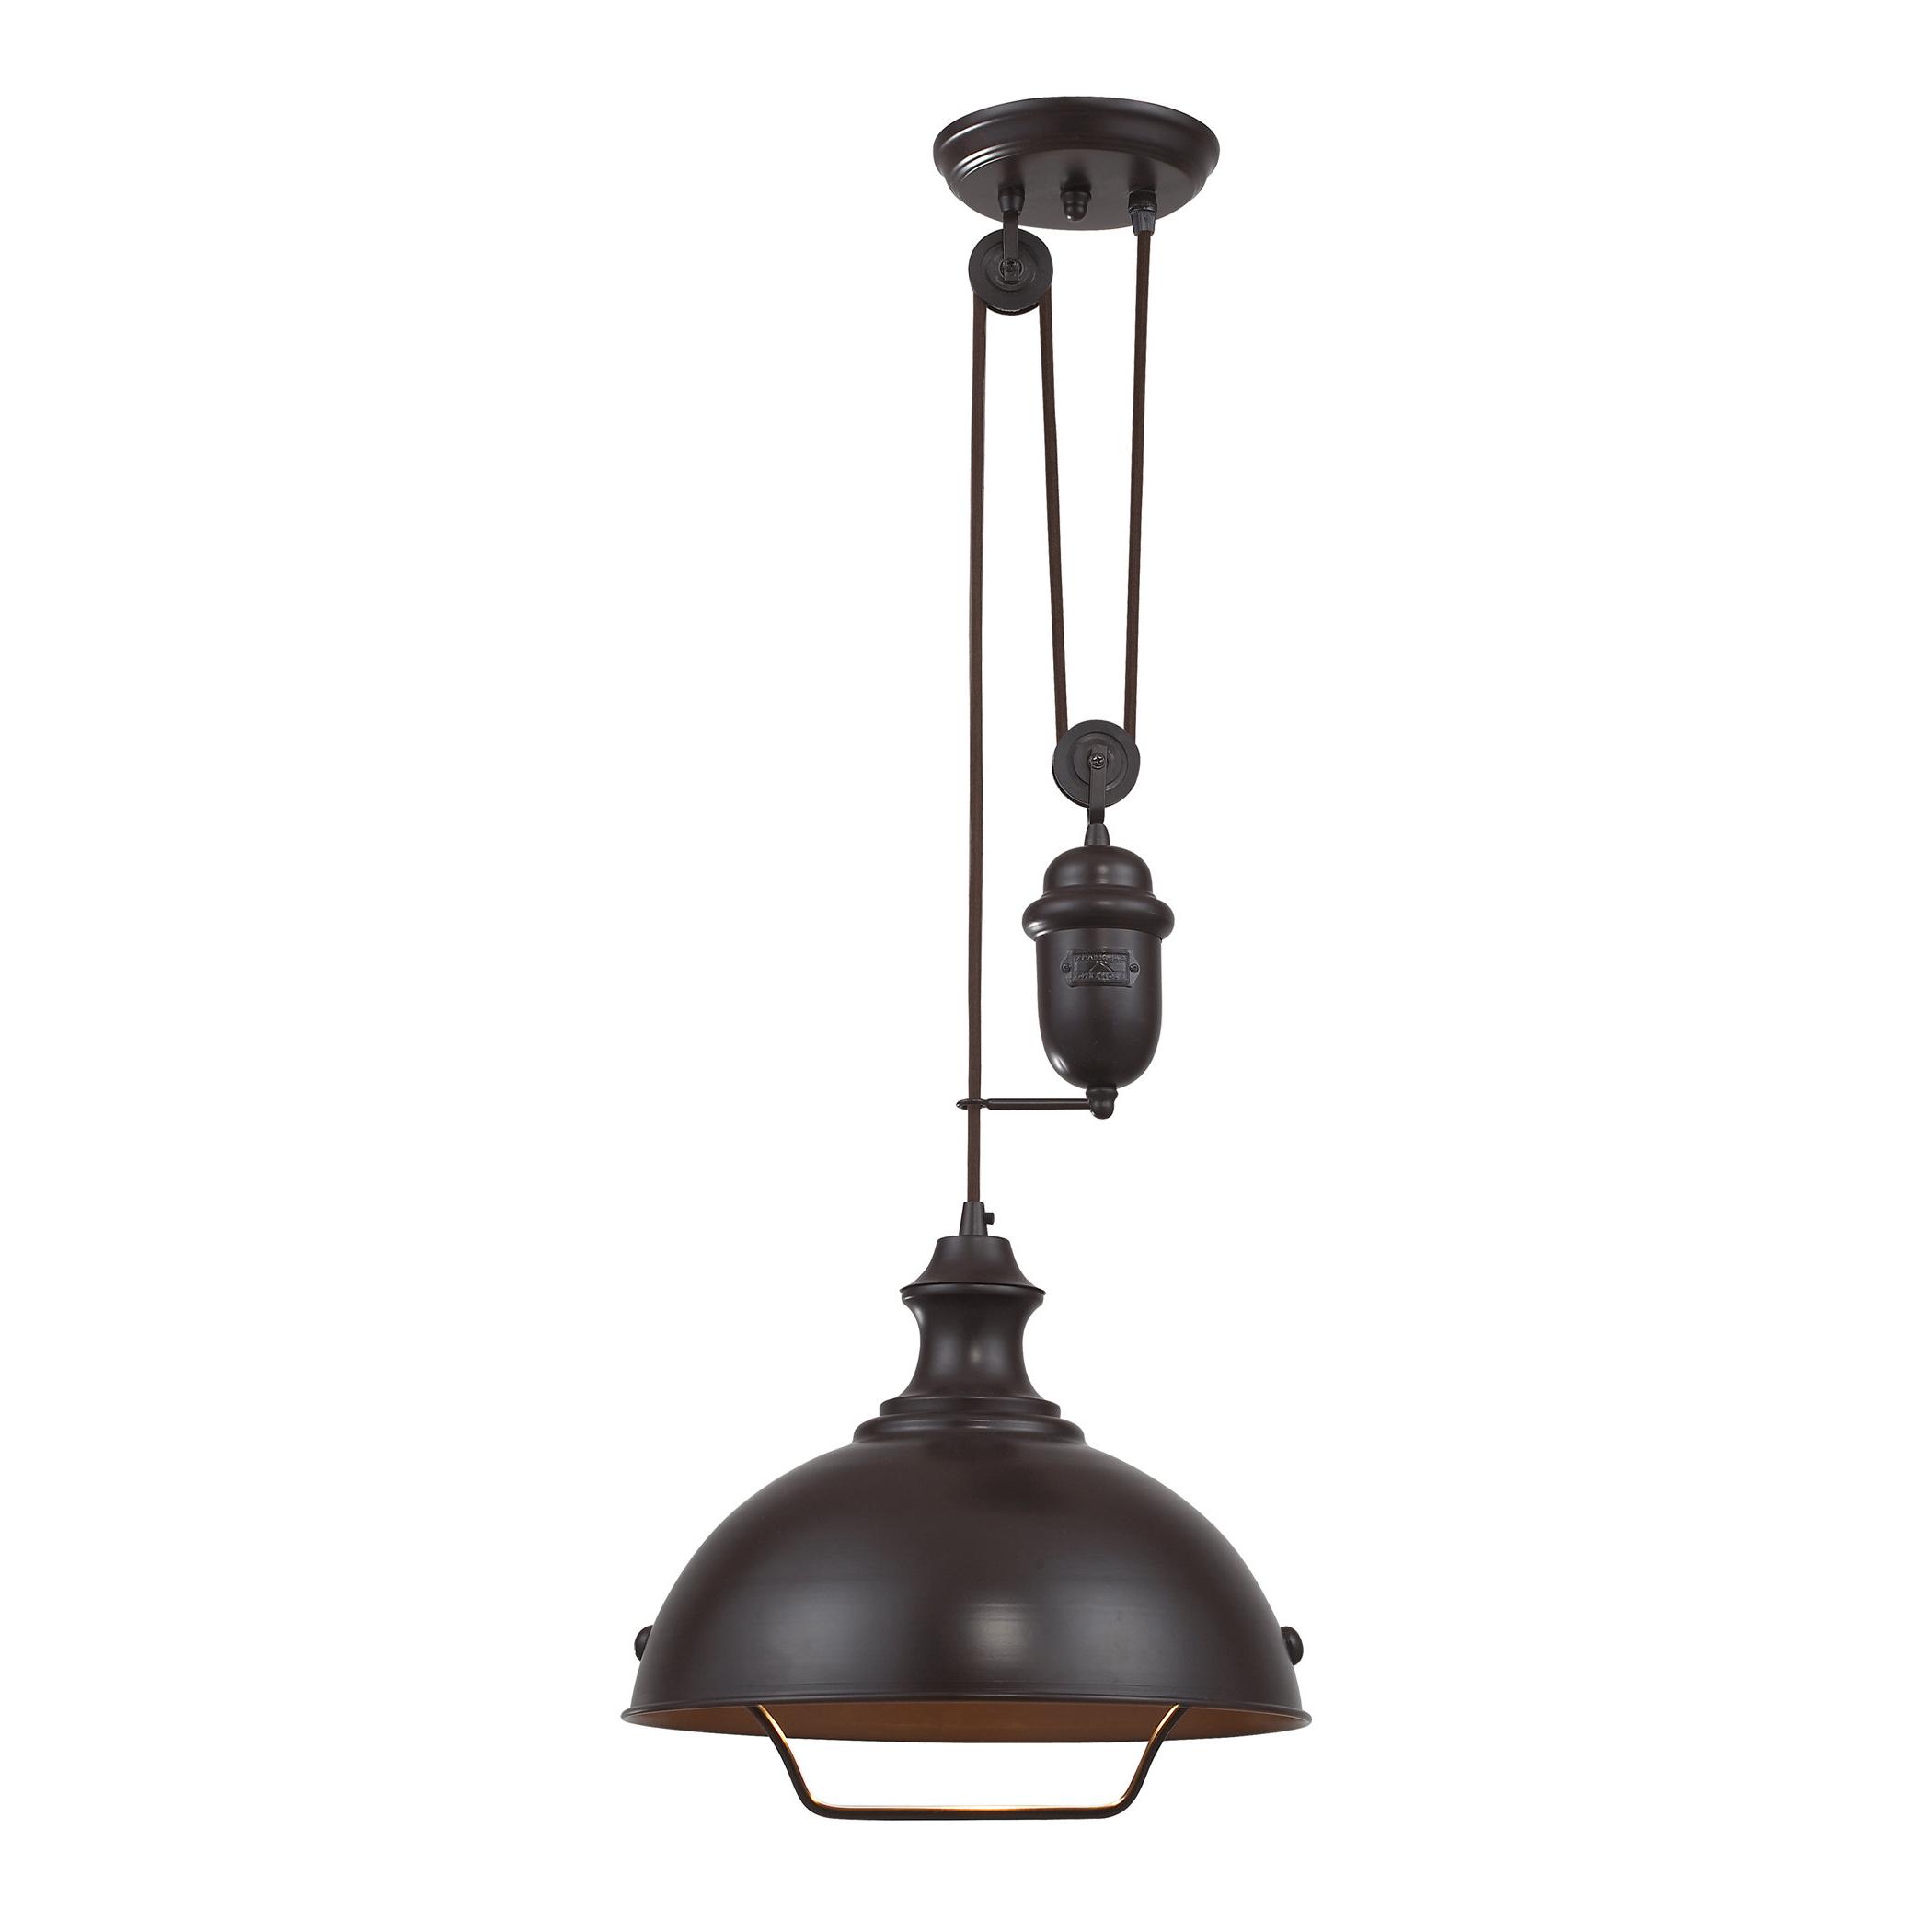 Most Recent Legrand 1 Light Single Dome Pendant Within Freeda 1 Light Single Dome Pendants (View 13 of 20)